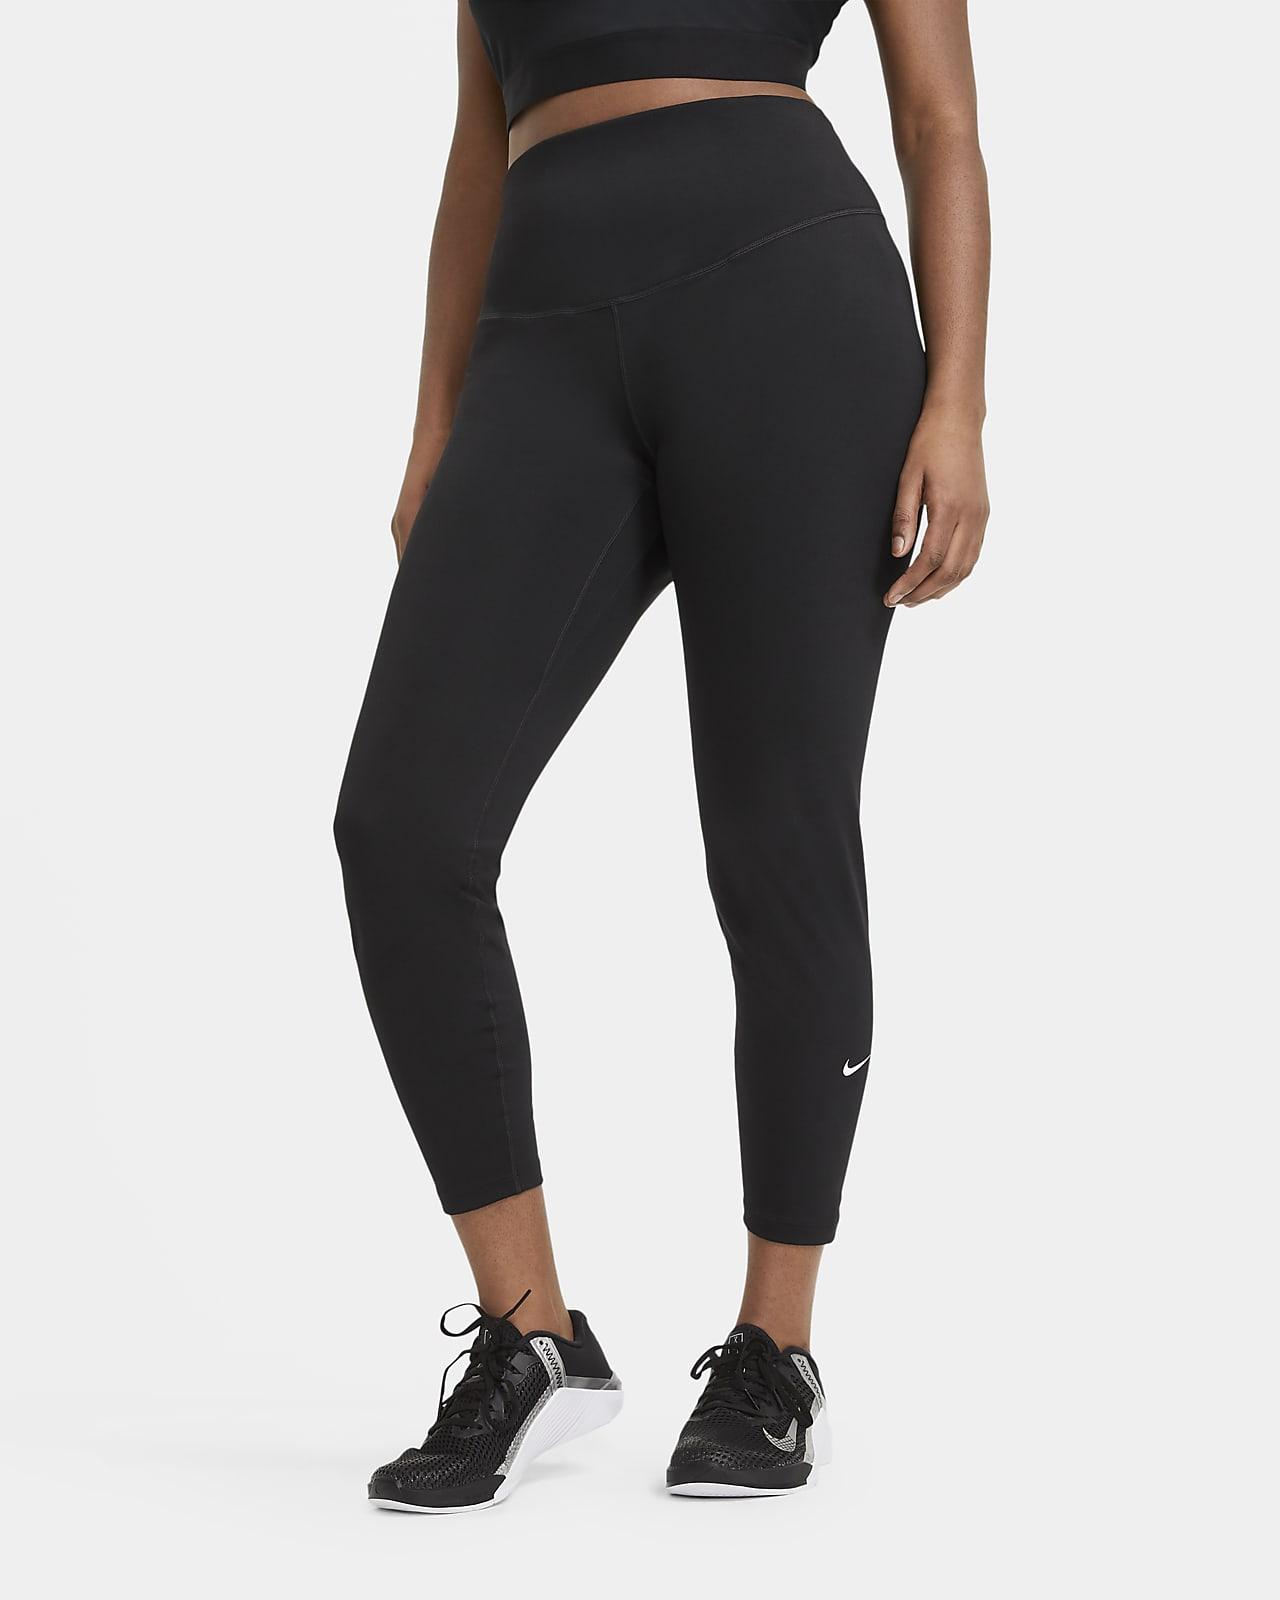 Leggings a vita media Nike One (Plus size) - Donna